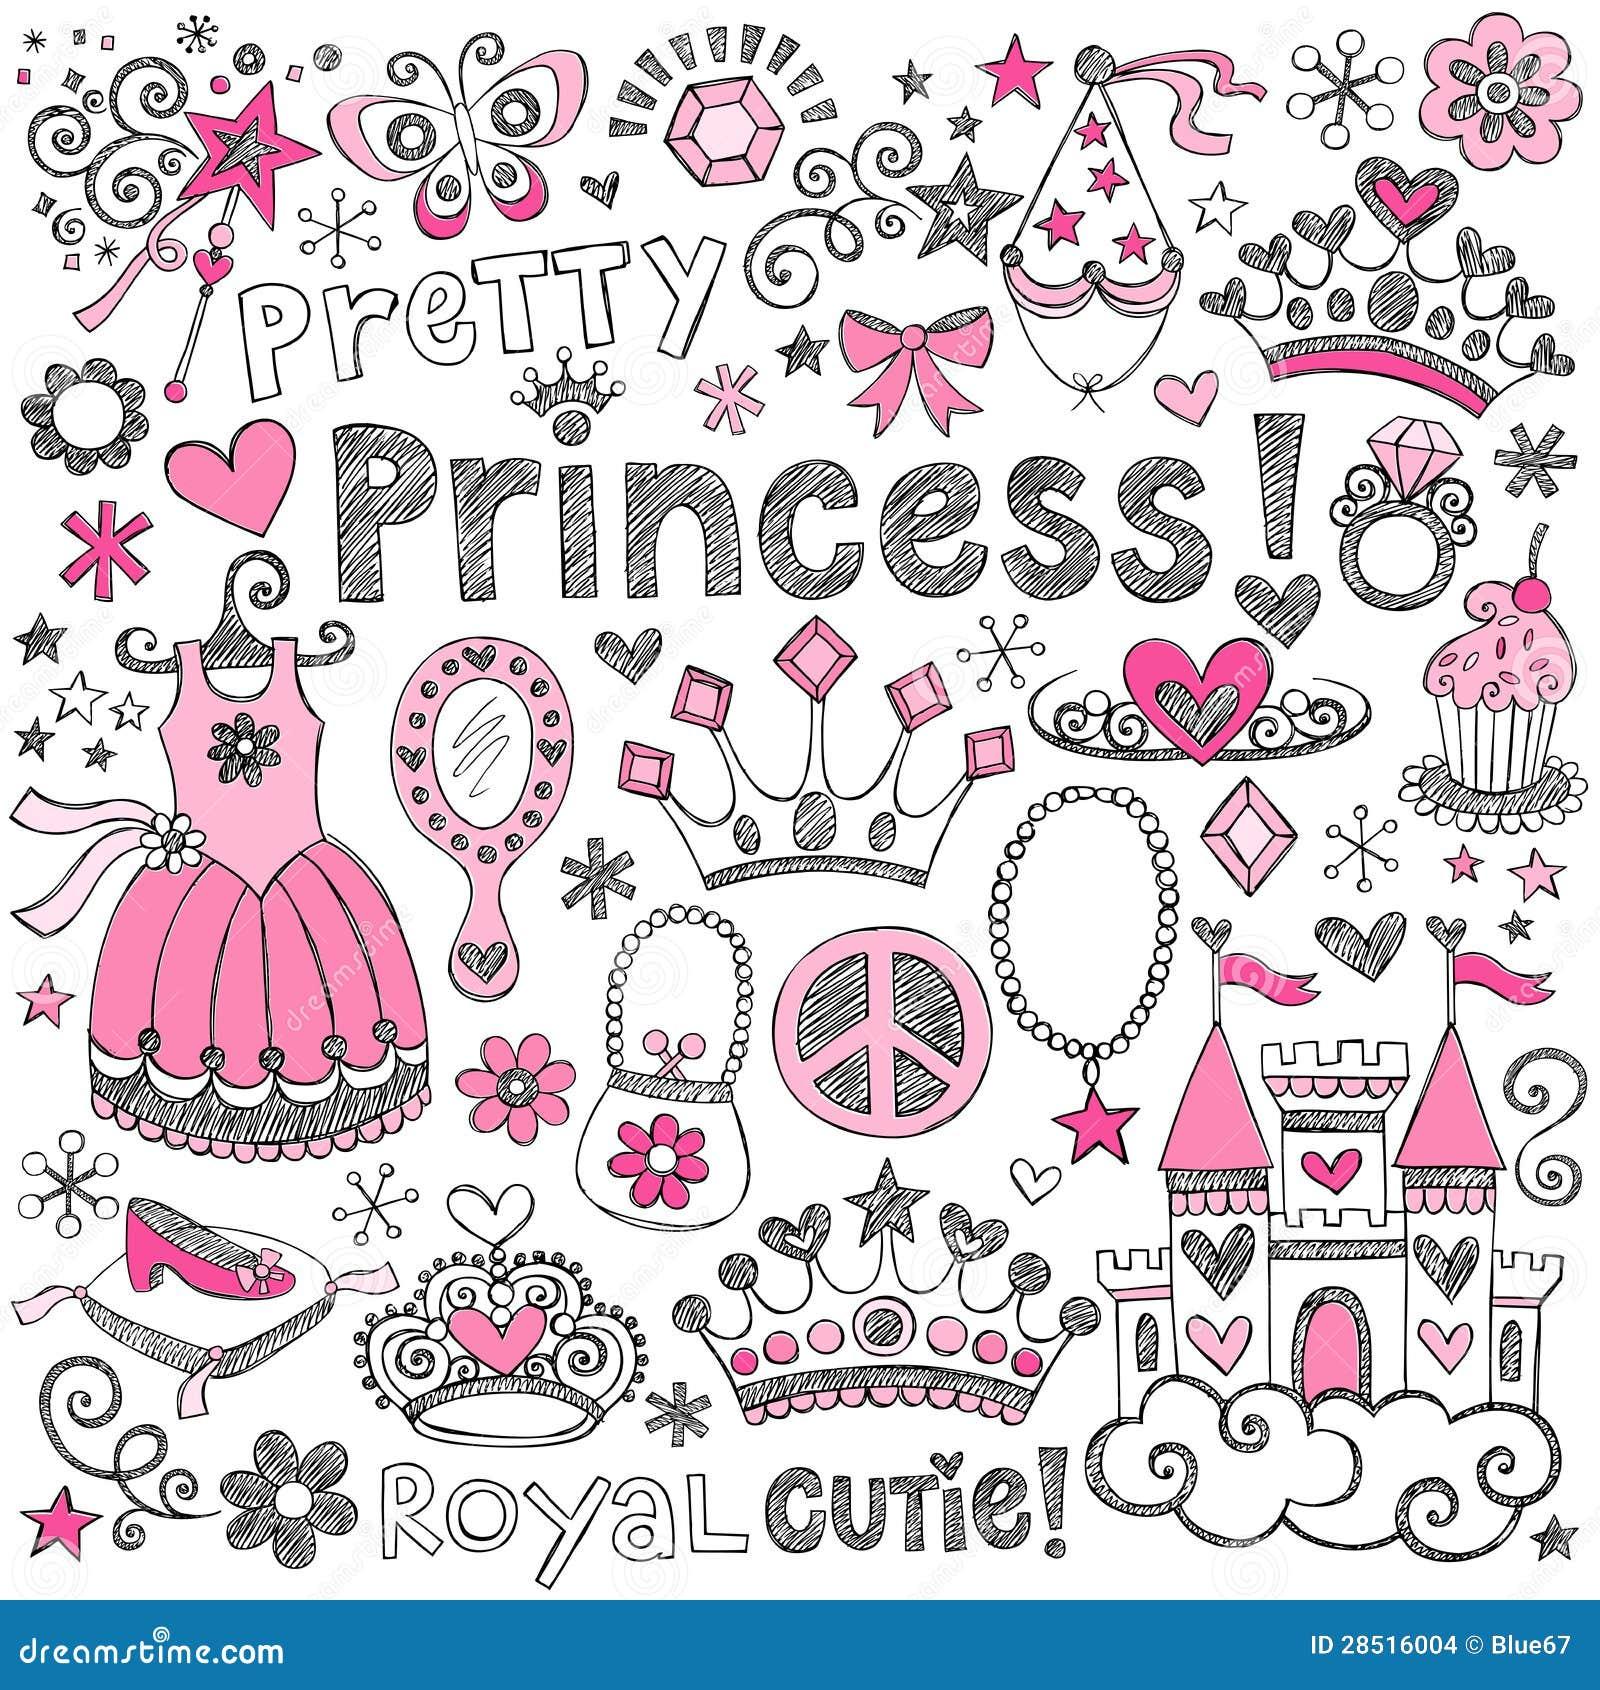 Princess Tiara Royalty Sketchy Doodles Vector Set Stock